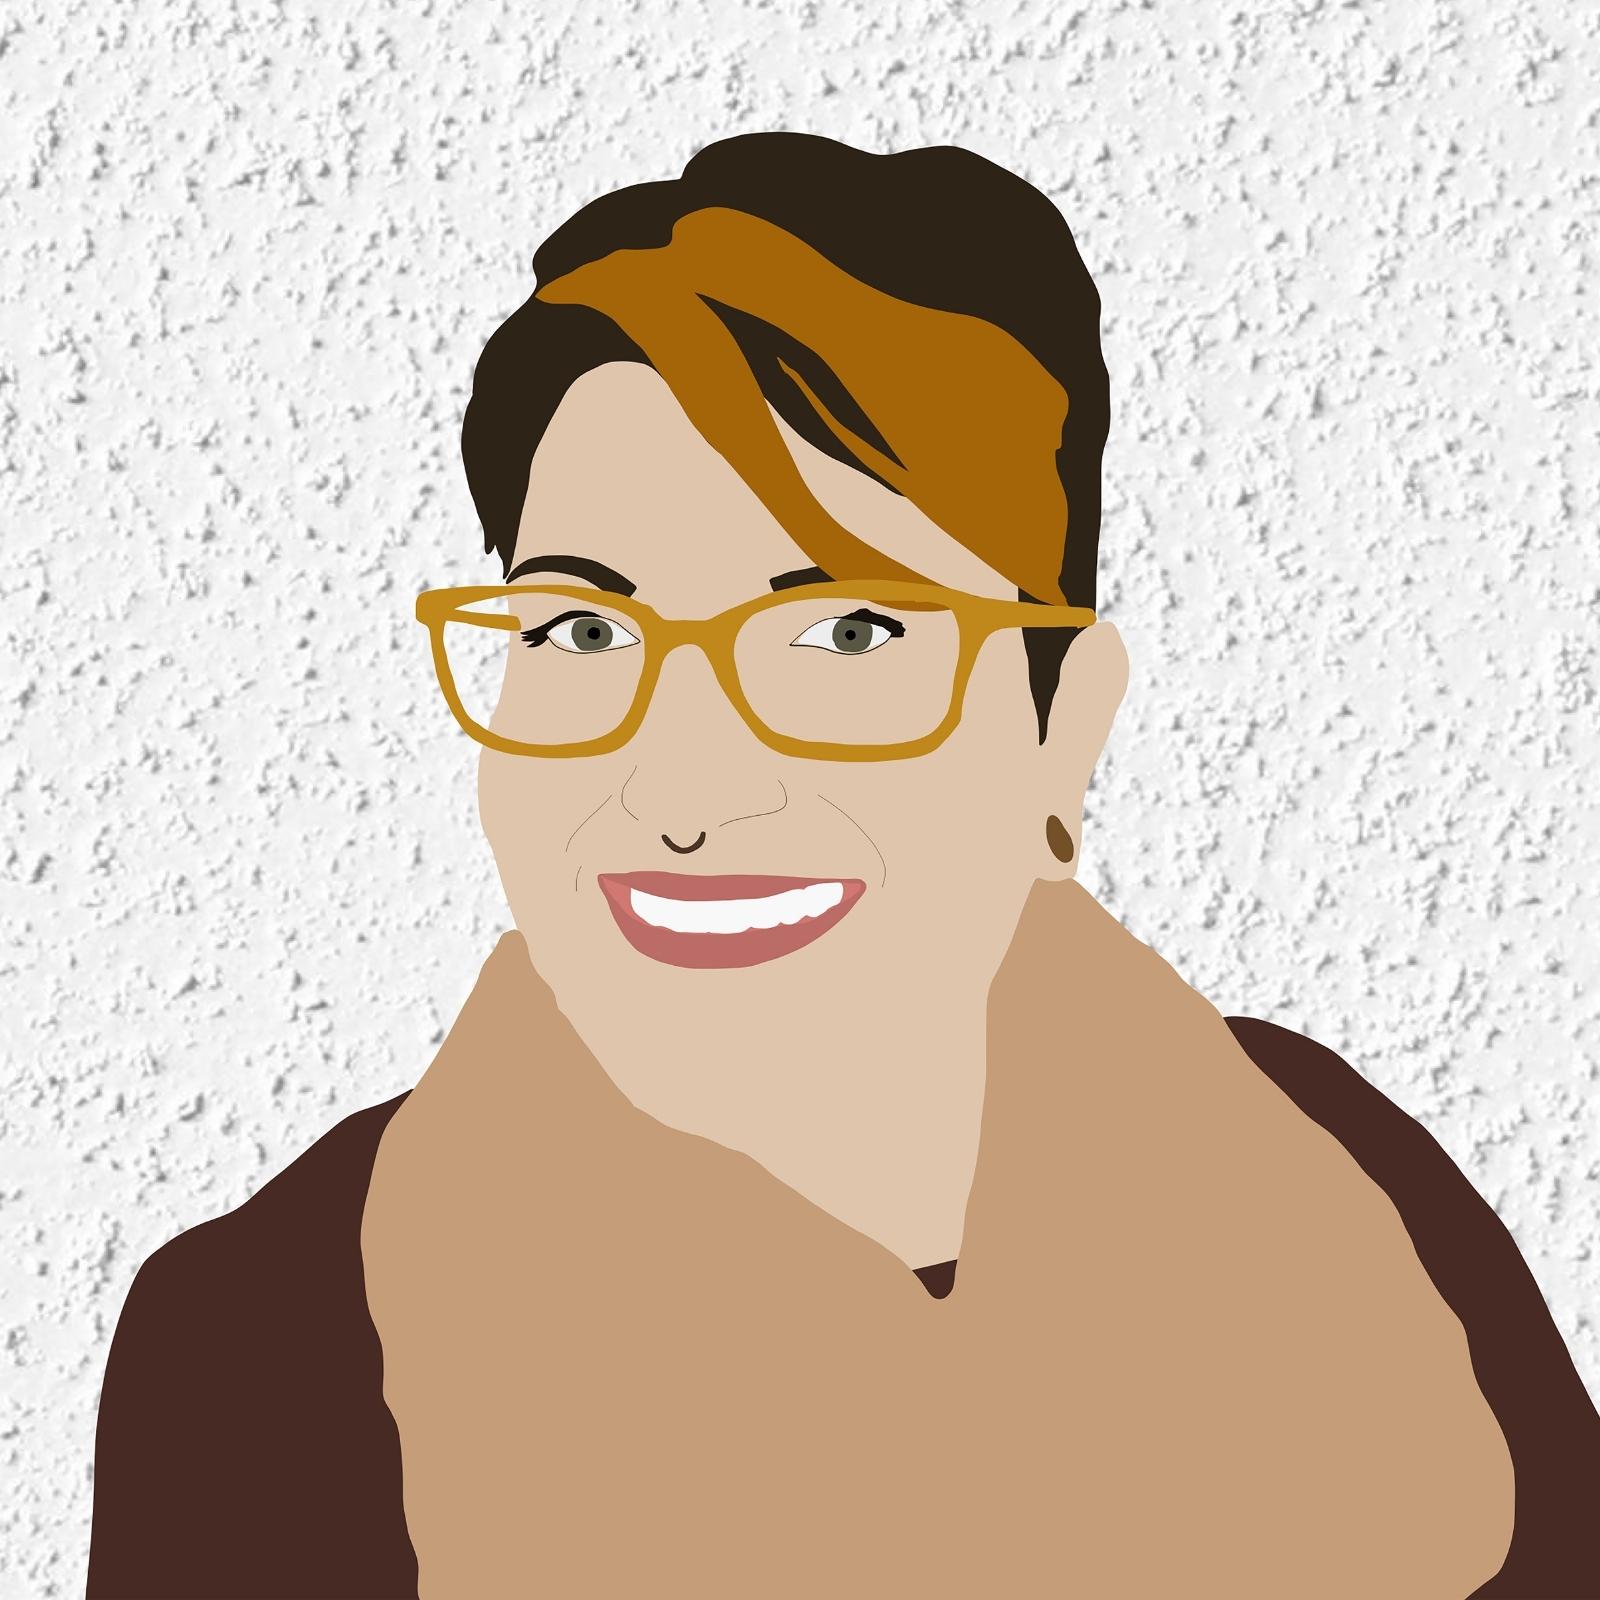 Digital illustration of Amanda smiling against a white stucco background.